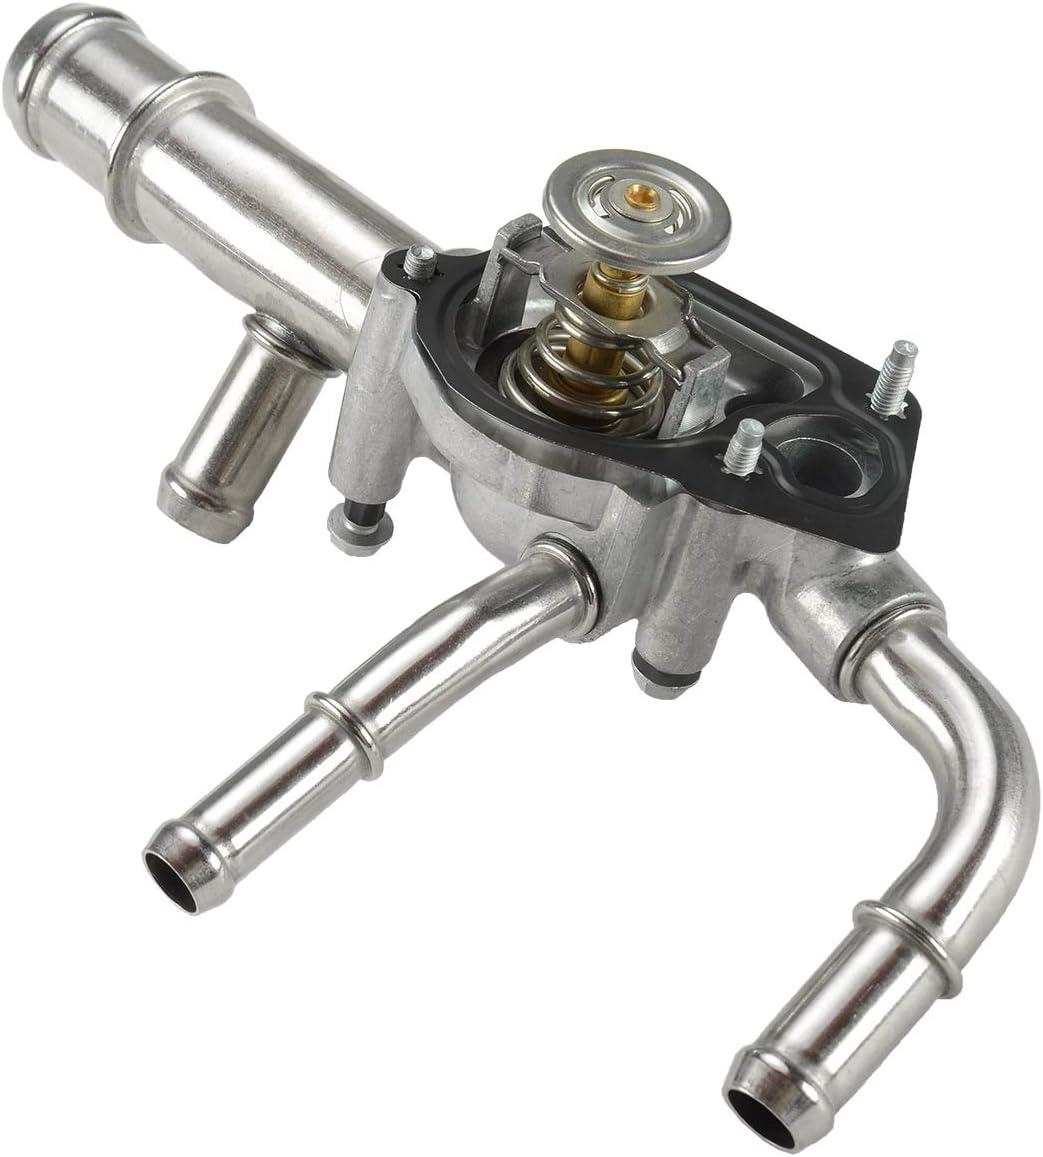 A-Premium Engine Coolant Thermostat Housing Assembly Compatible with Allure LaCrosse Cadillac SRX XTS Equinox Equinox GMC Pontiac Saturn 3.0L 3.6L